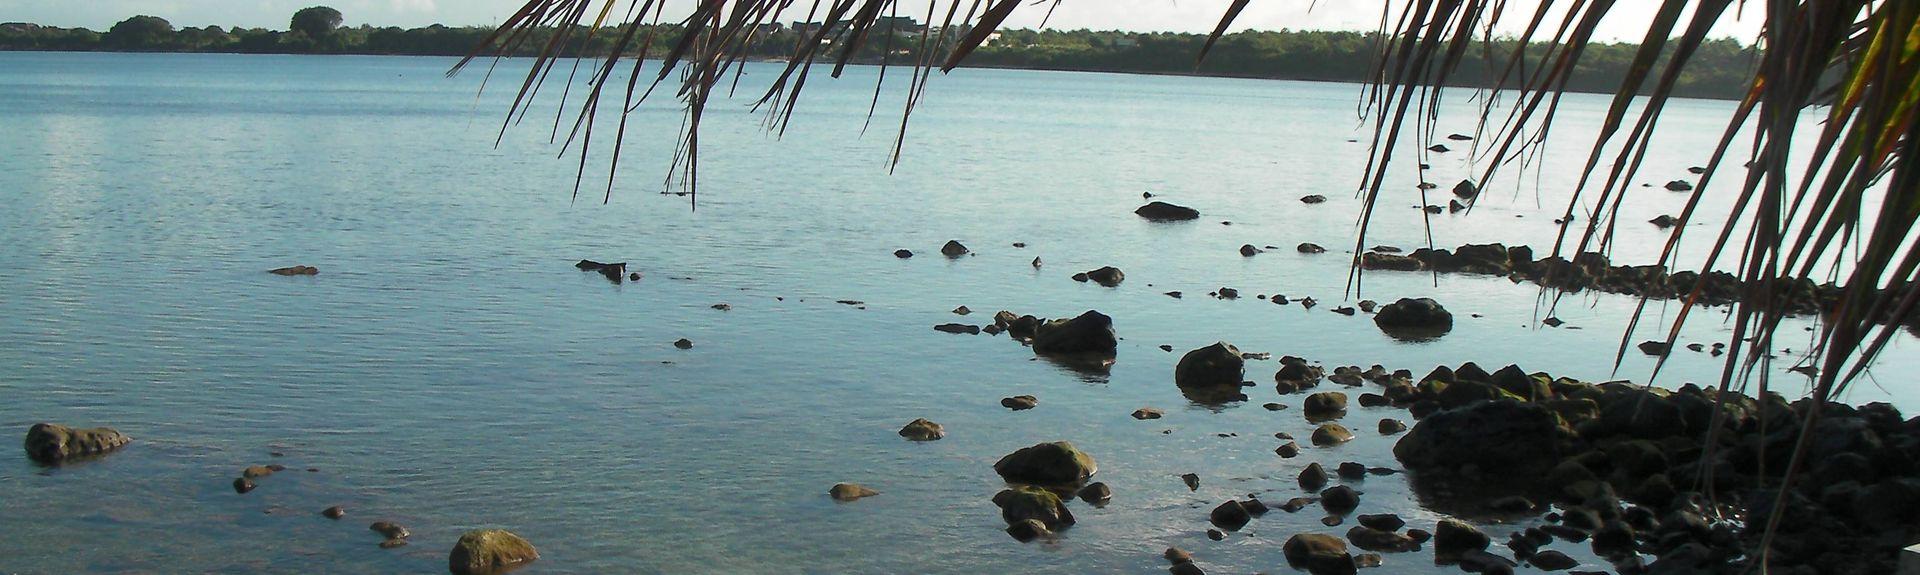 Flic-en-Flac Beach, Flic-en-Flac, Mauritius